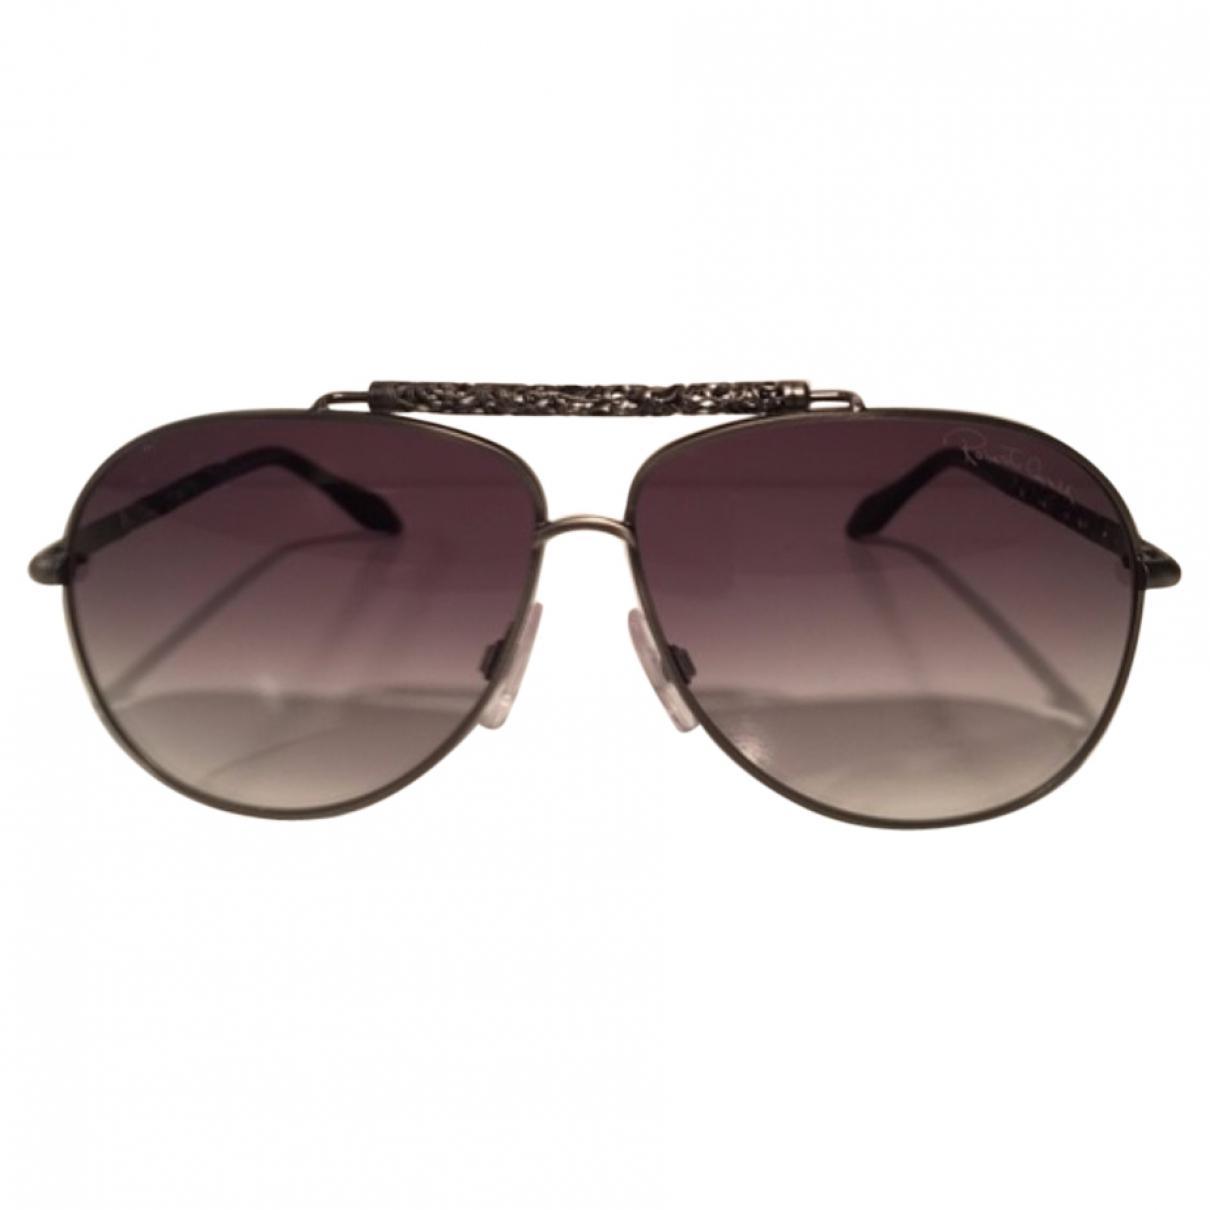 6af0c26e568 Roberto Cavalli. Women s Metallic Aviator Sunglasses. £97 From Vestiaire  Collective